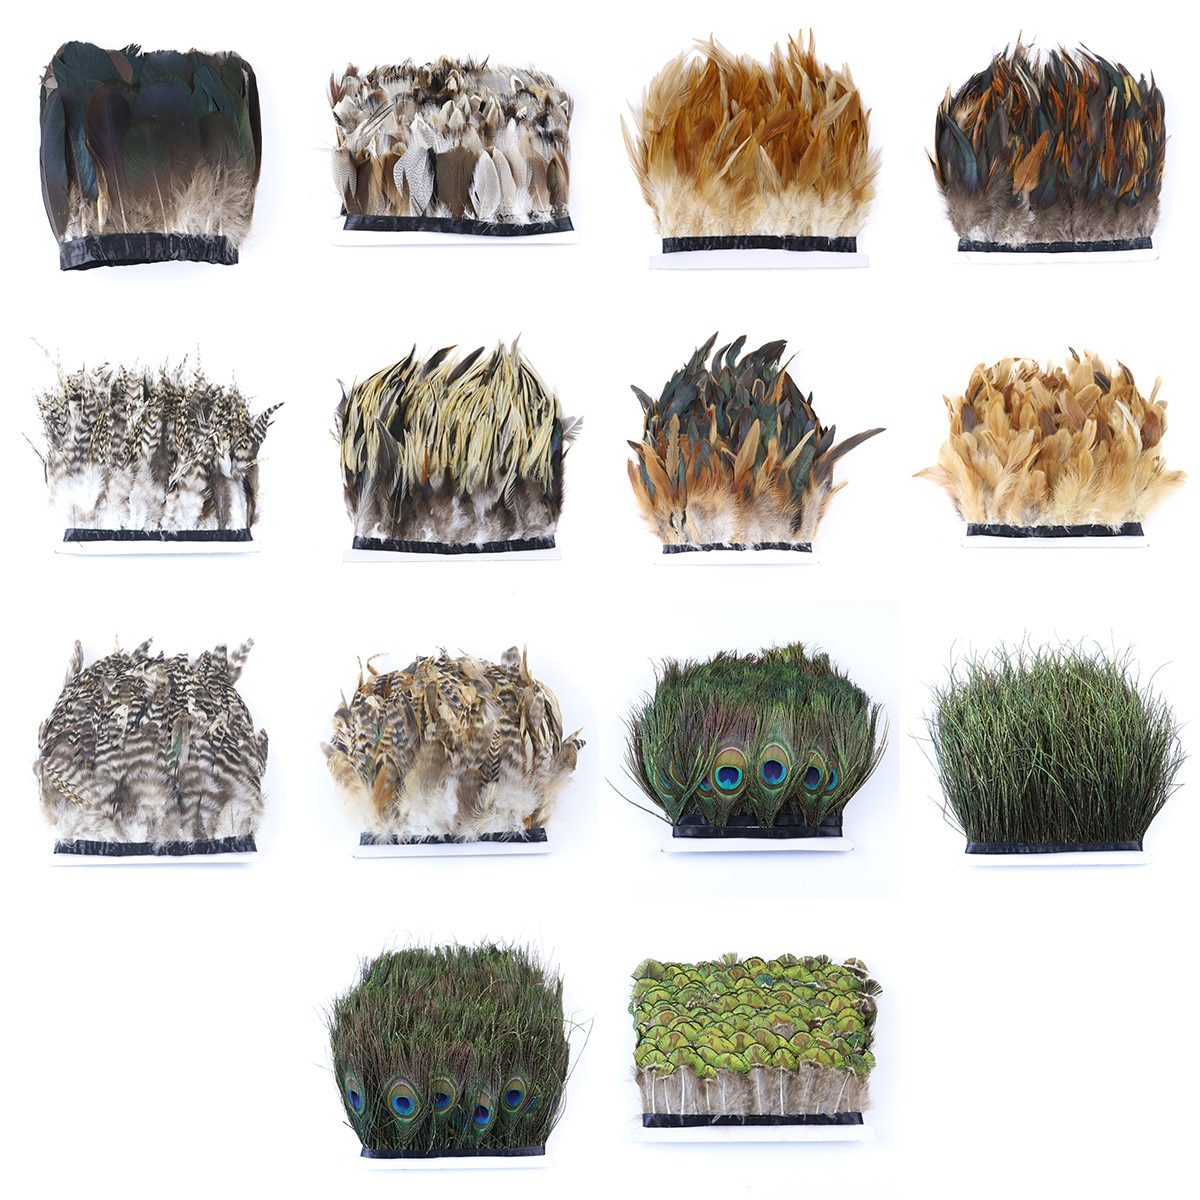 Adorno de plumas naturales de ganso, pavo real, plumas, flecos DIY, artesanías, vestido con cintas, accesorios de decoración 1 yardas